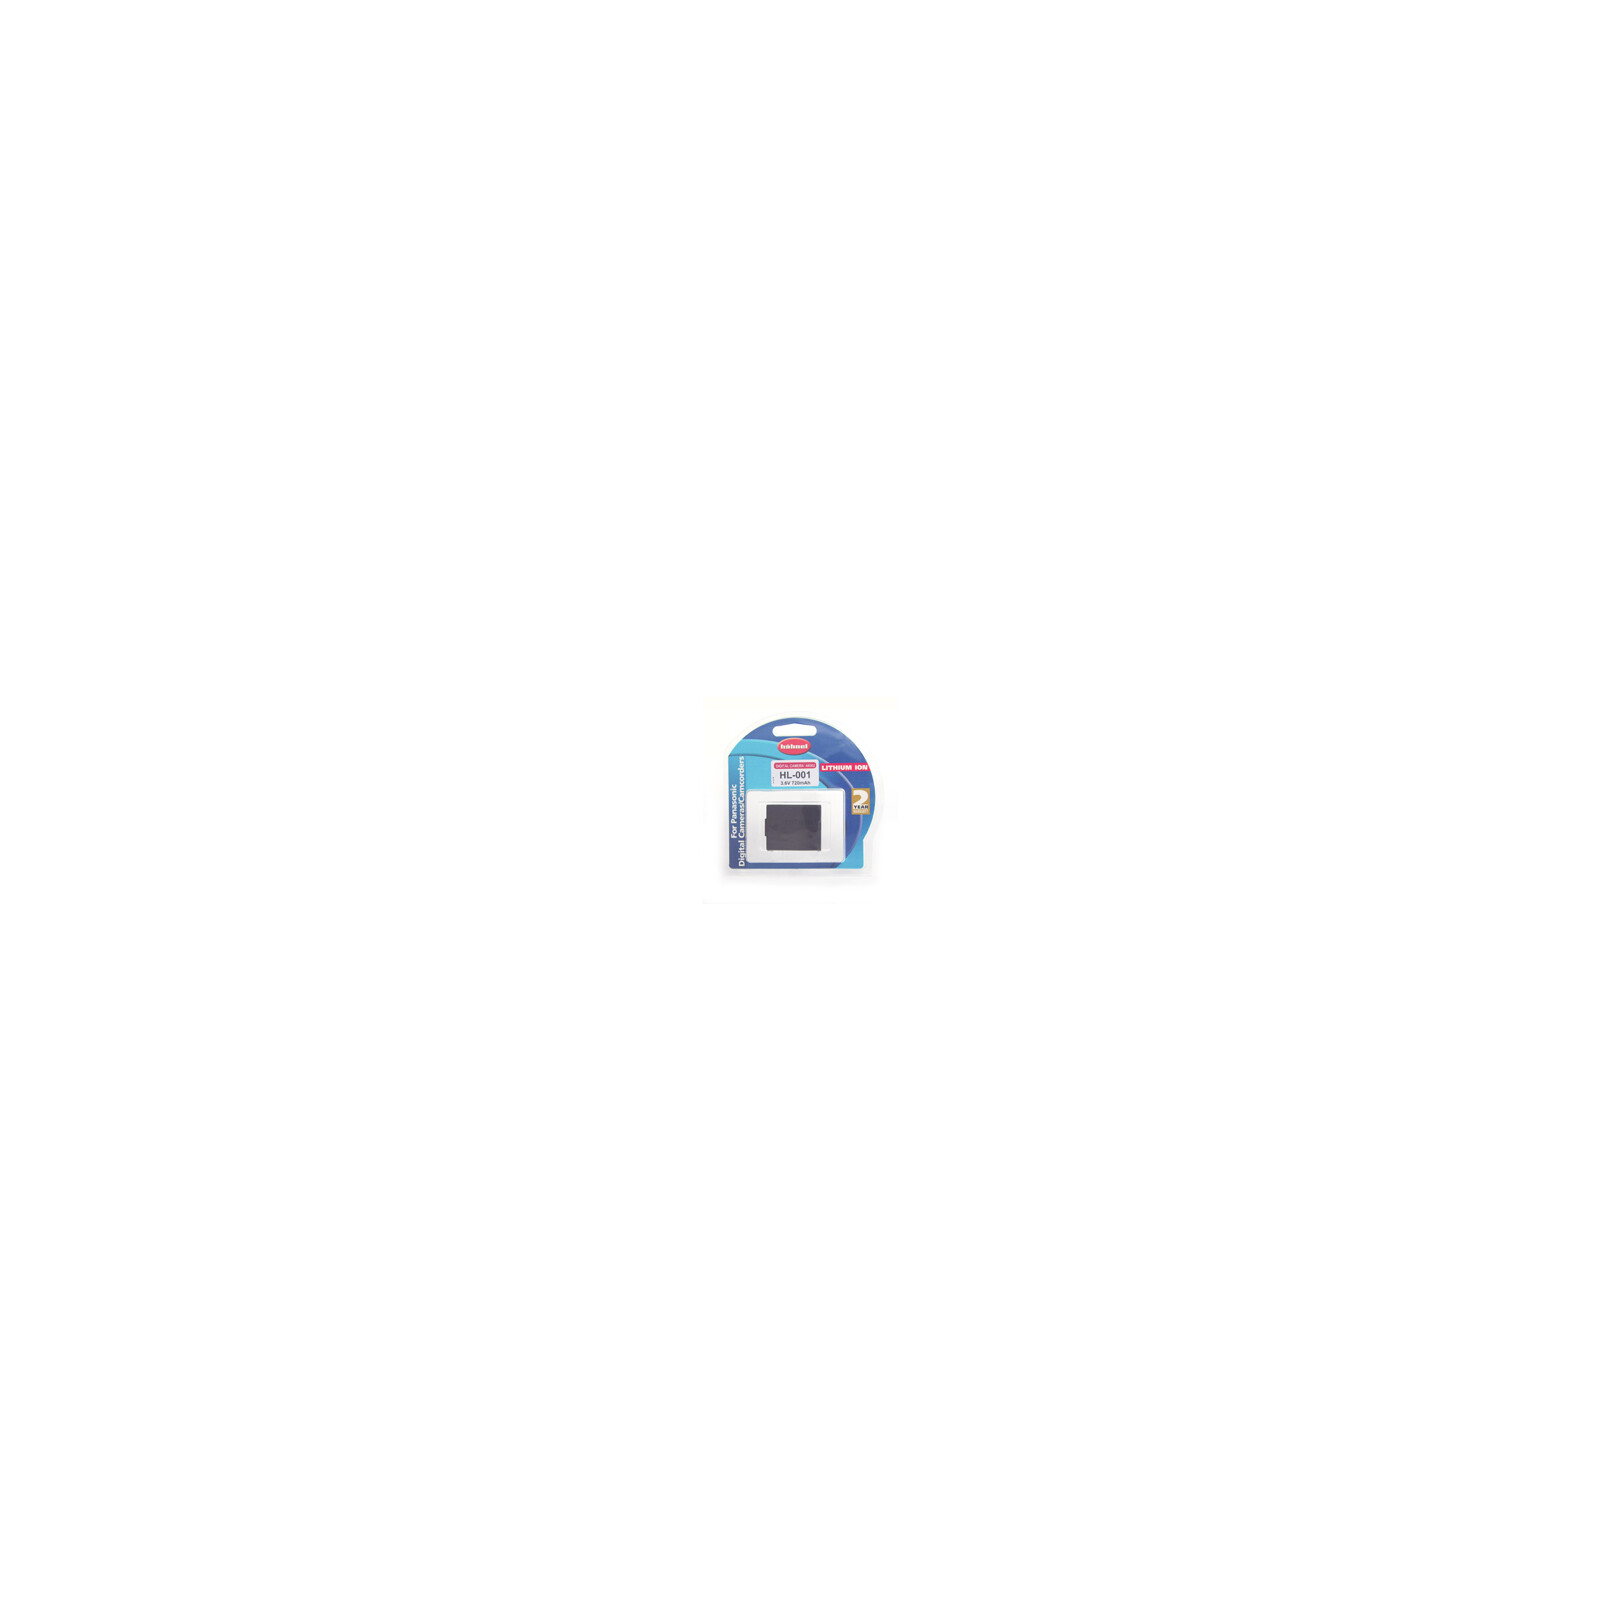 Hähnel Panasonic CGA-S001 Akku